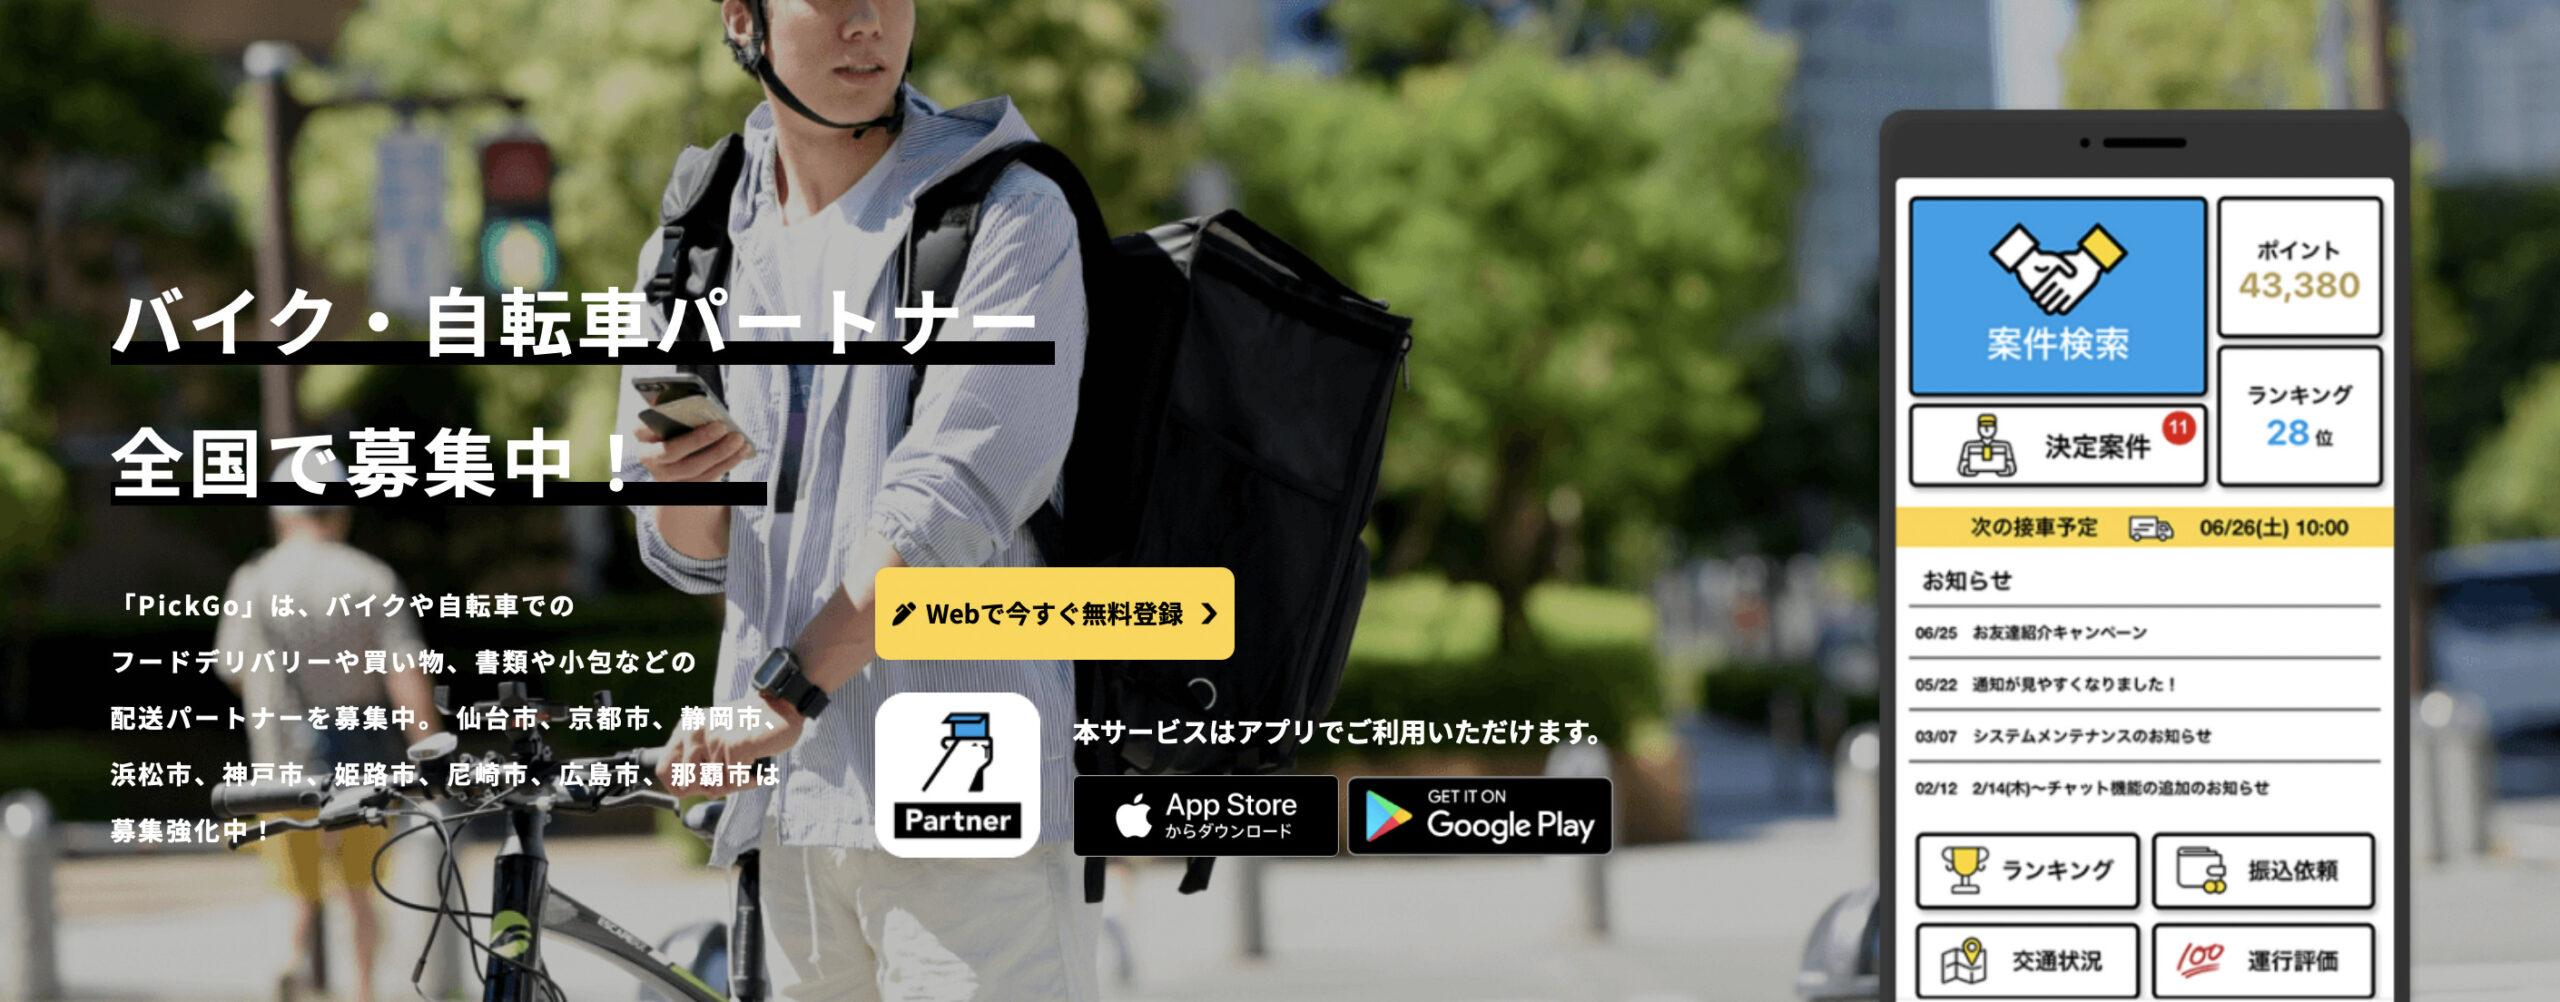 PickGo(ピックゴー)の配達員(バイク・自転車パートナー)募集